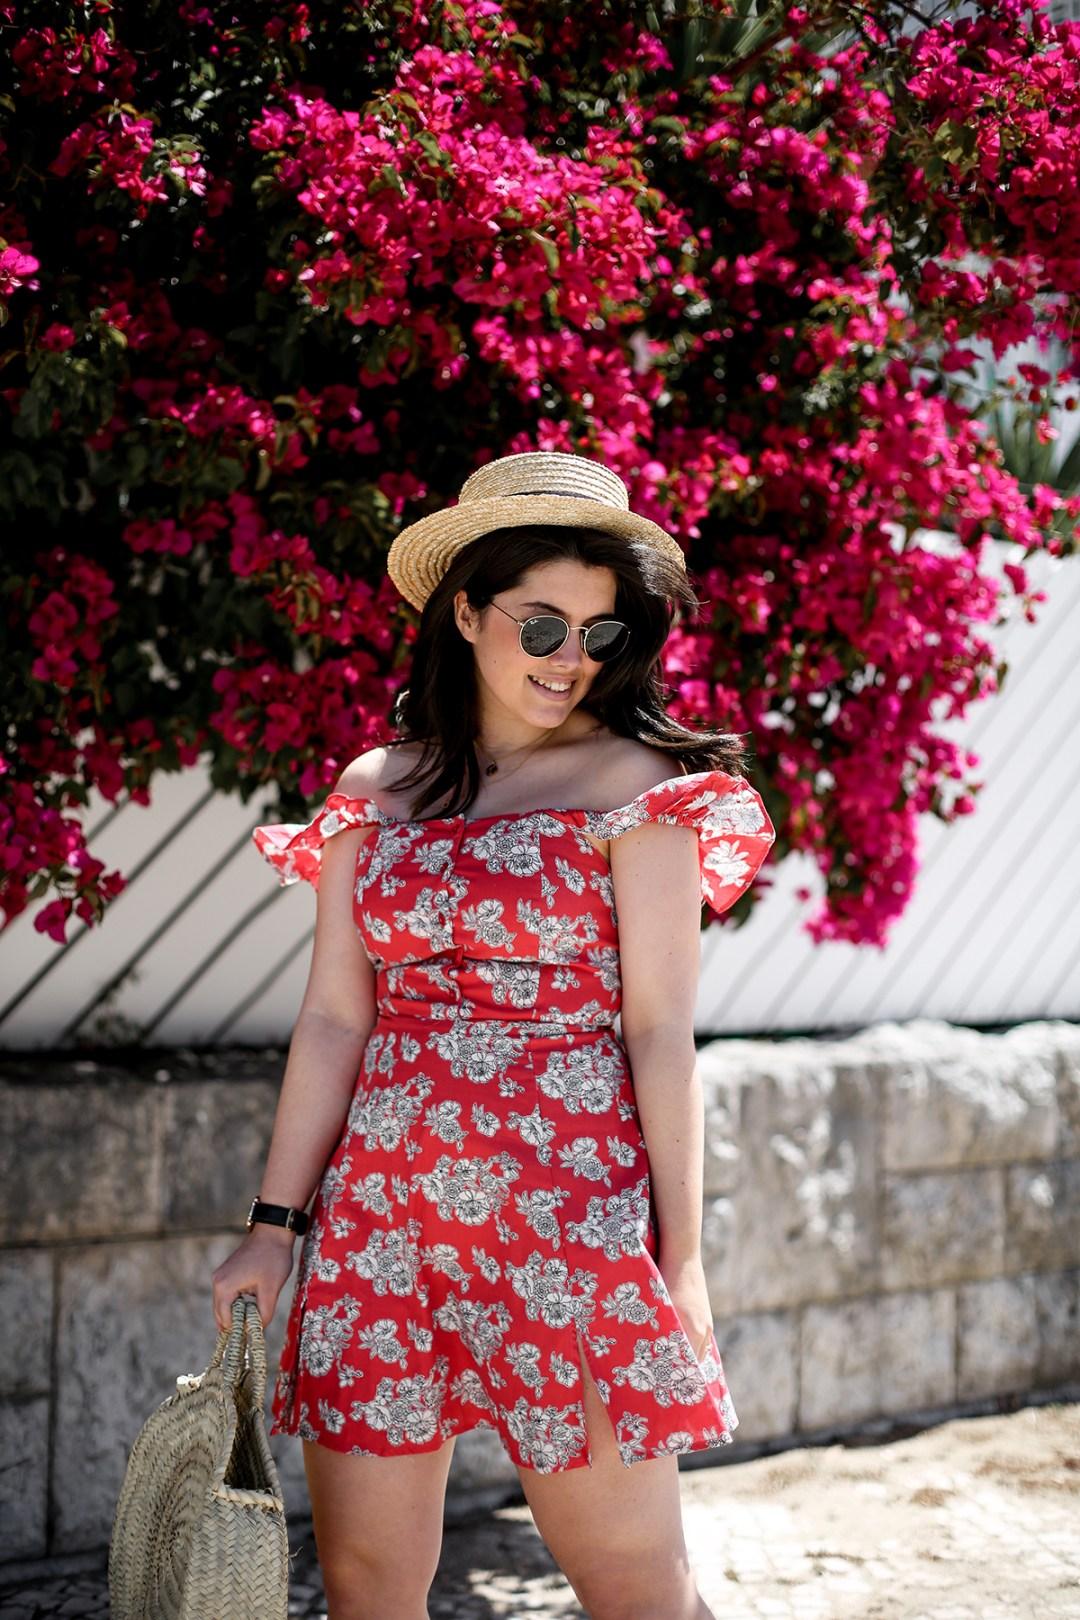 golden-goose-deluxe-brand-red-dress-asos-costa-caparica-spring-summer-myblueberrynightsblog5